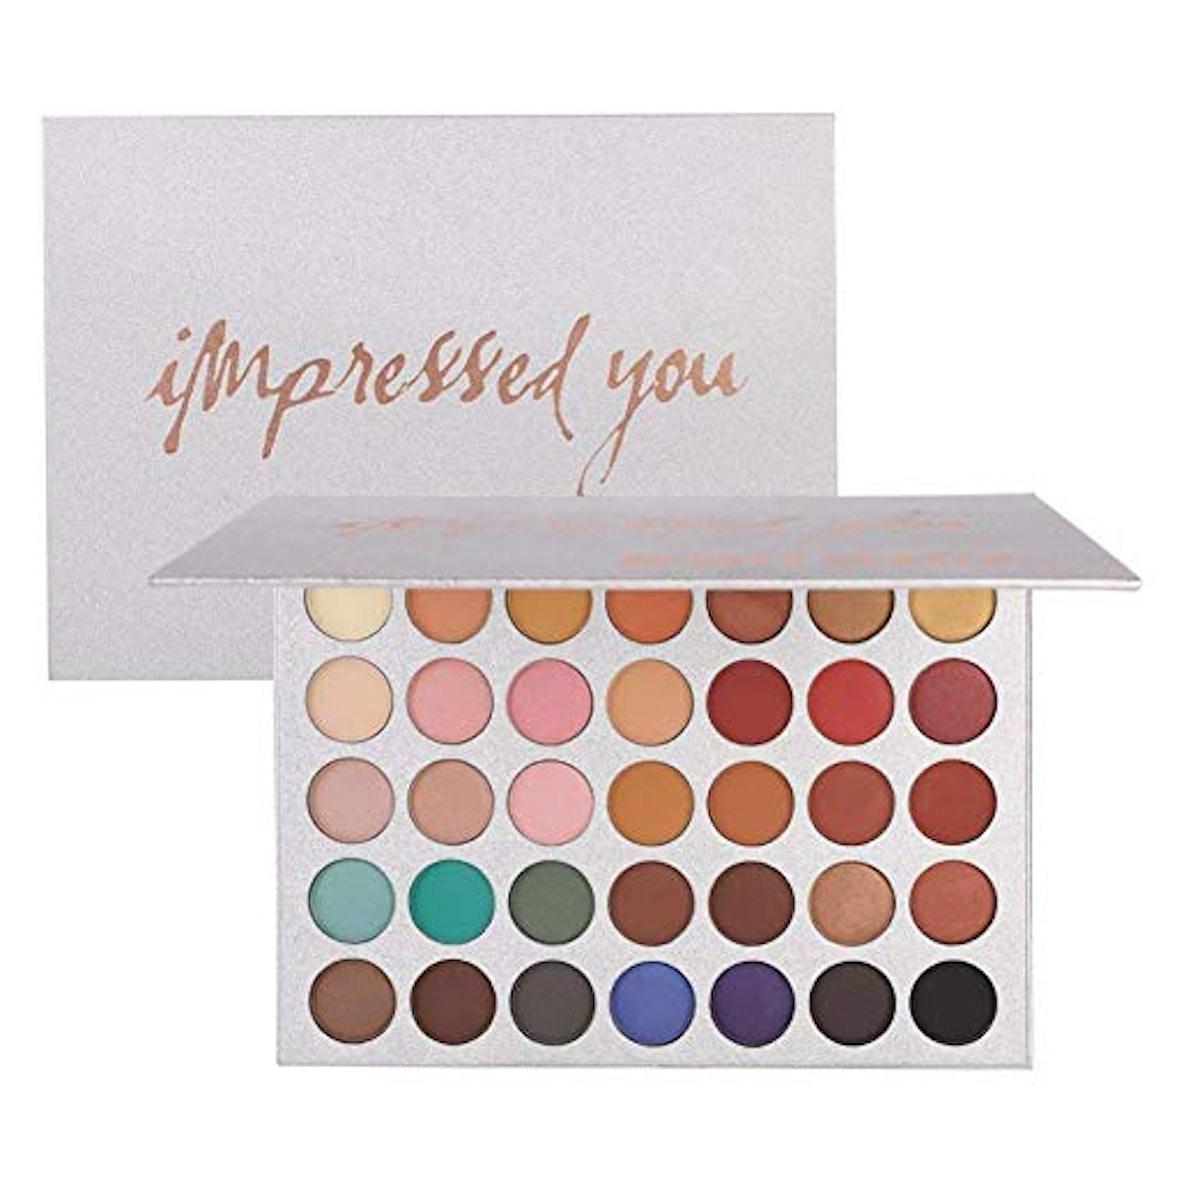 Beauty Glazed Pigmented Eyeshadow Palette